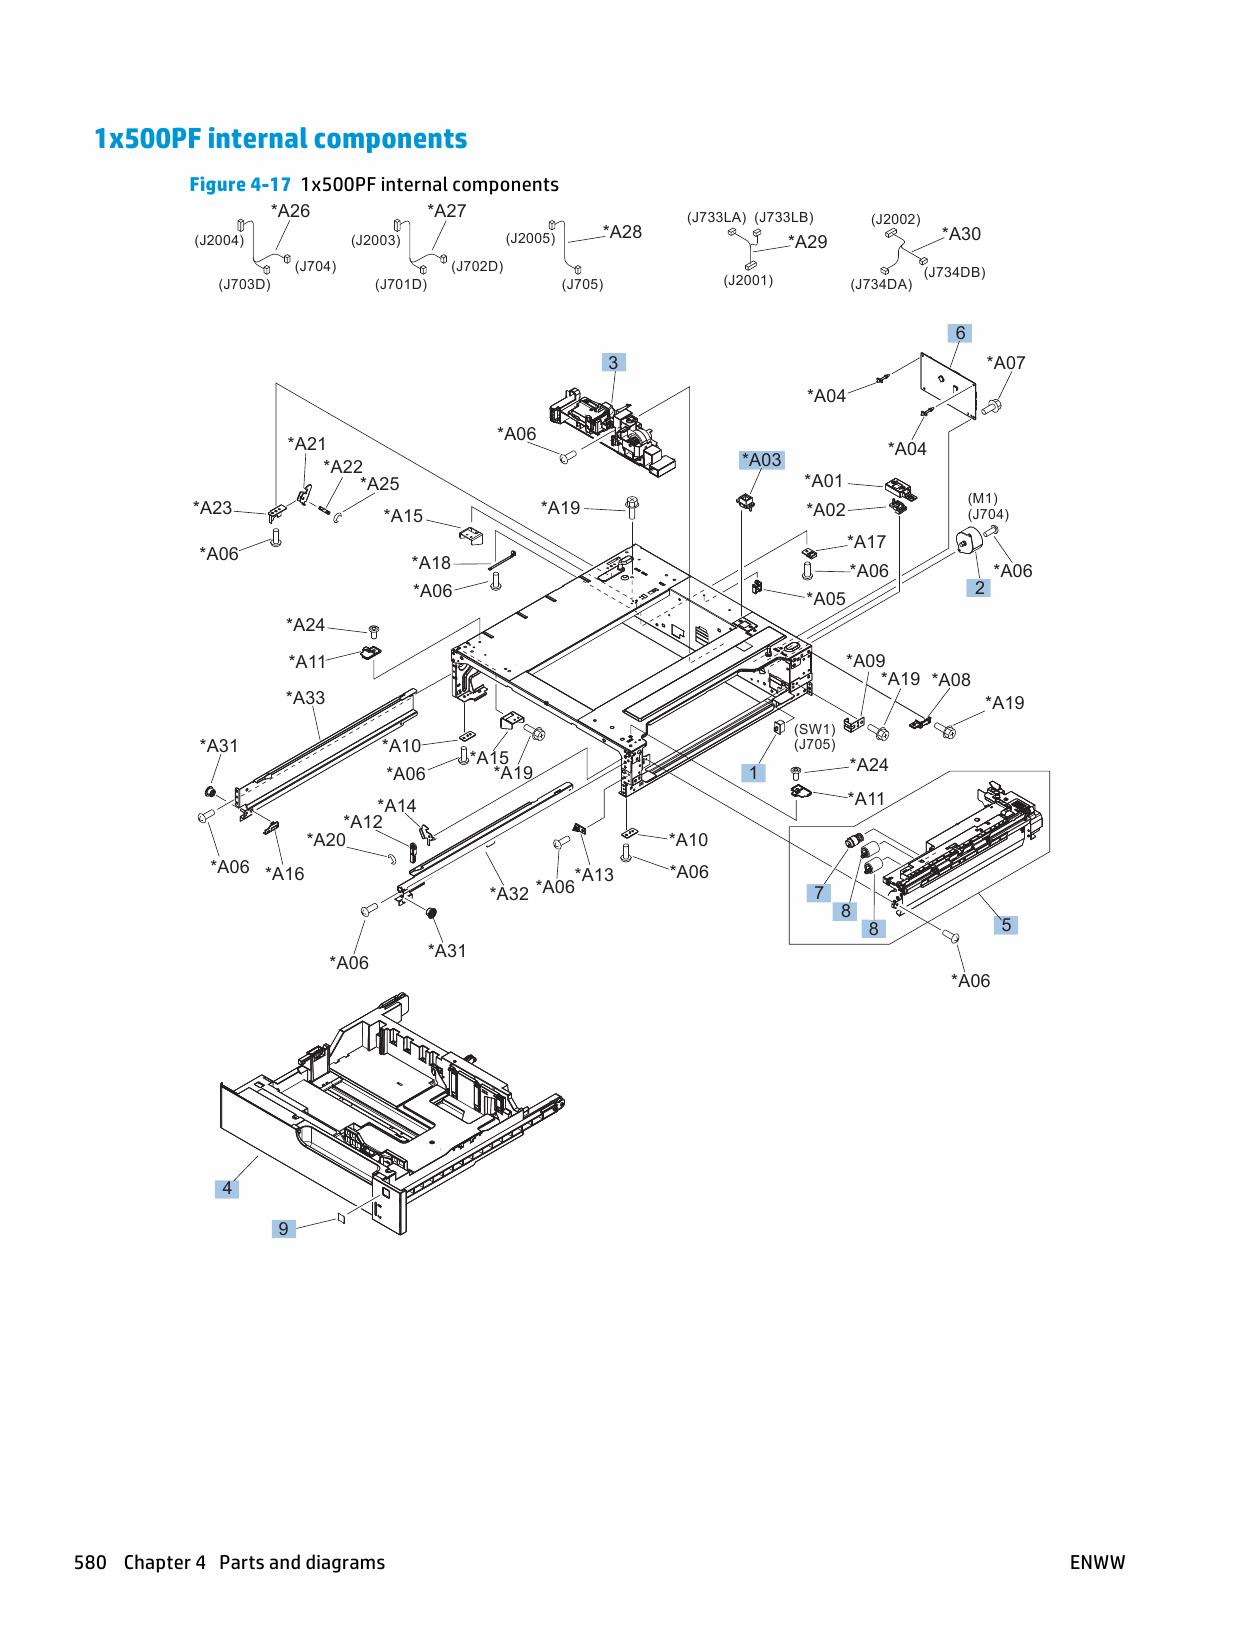 parts of pdf not printing